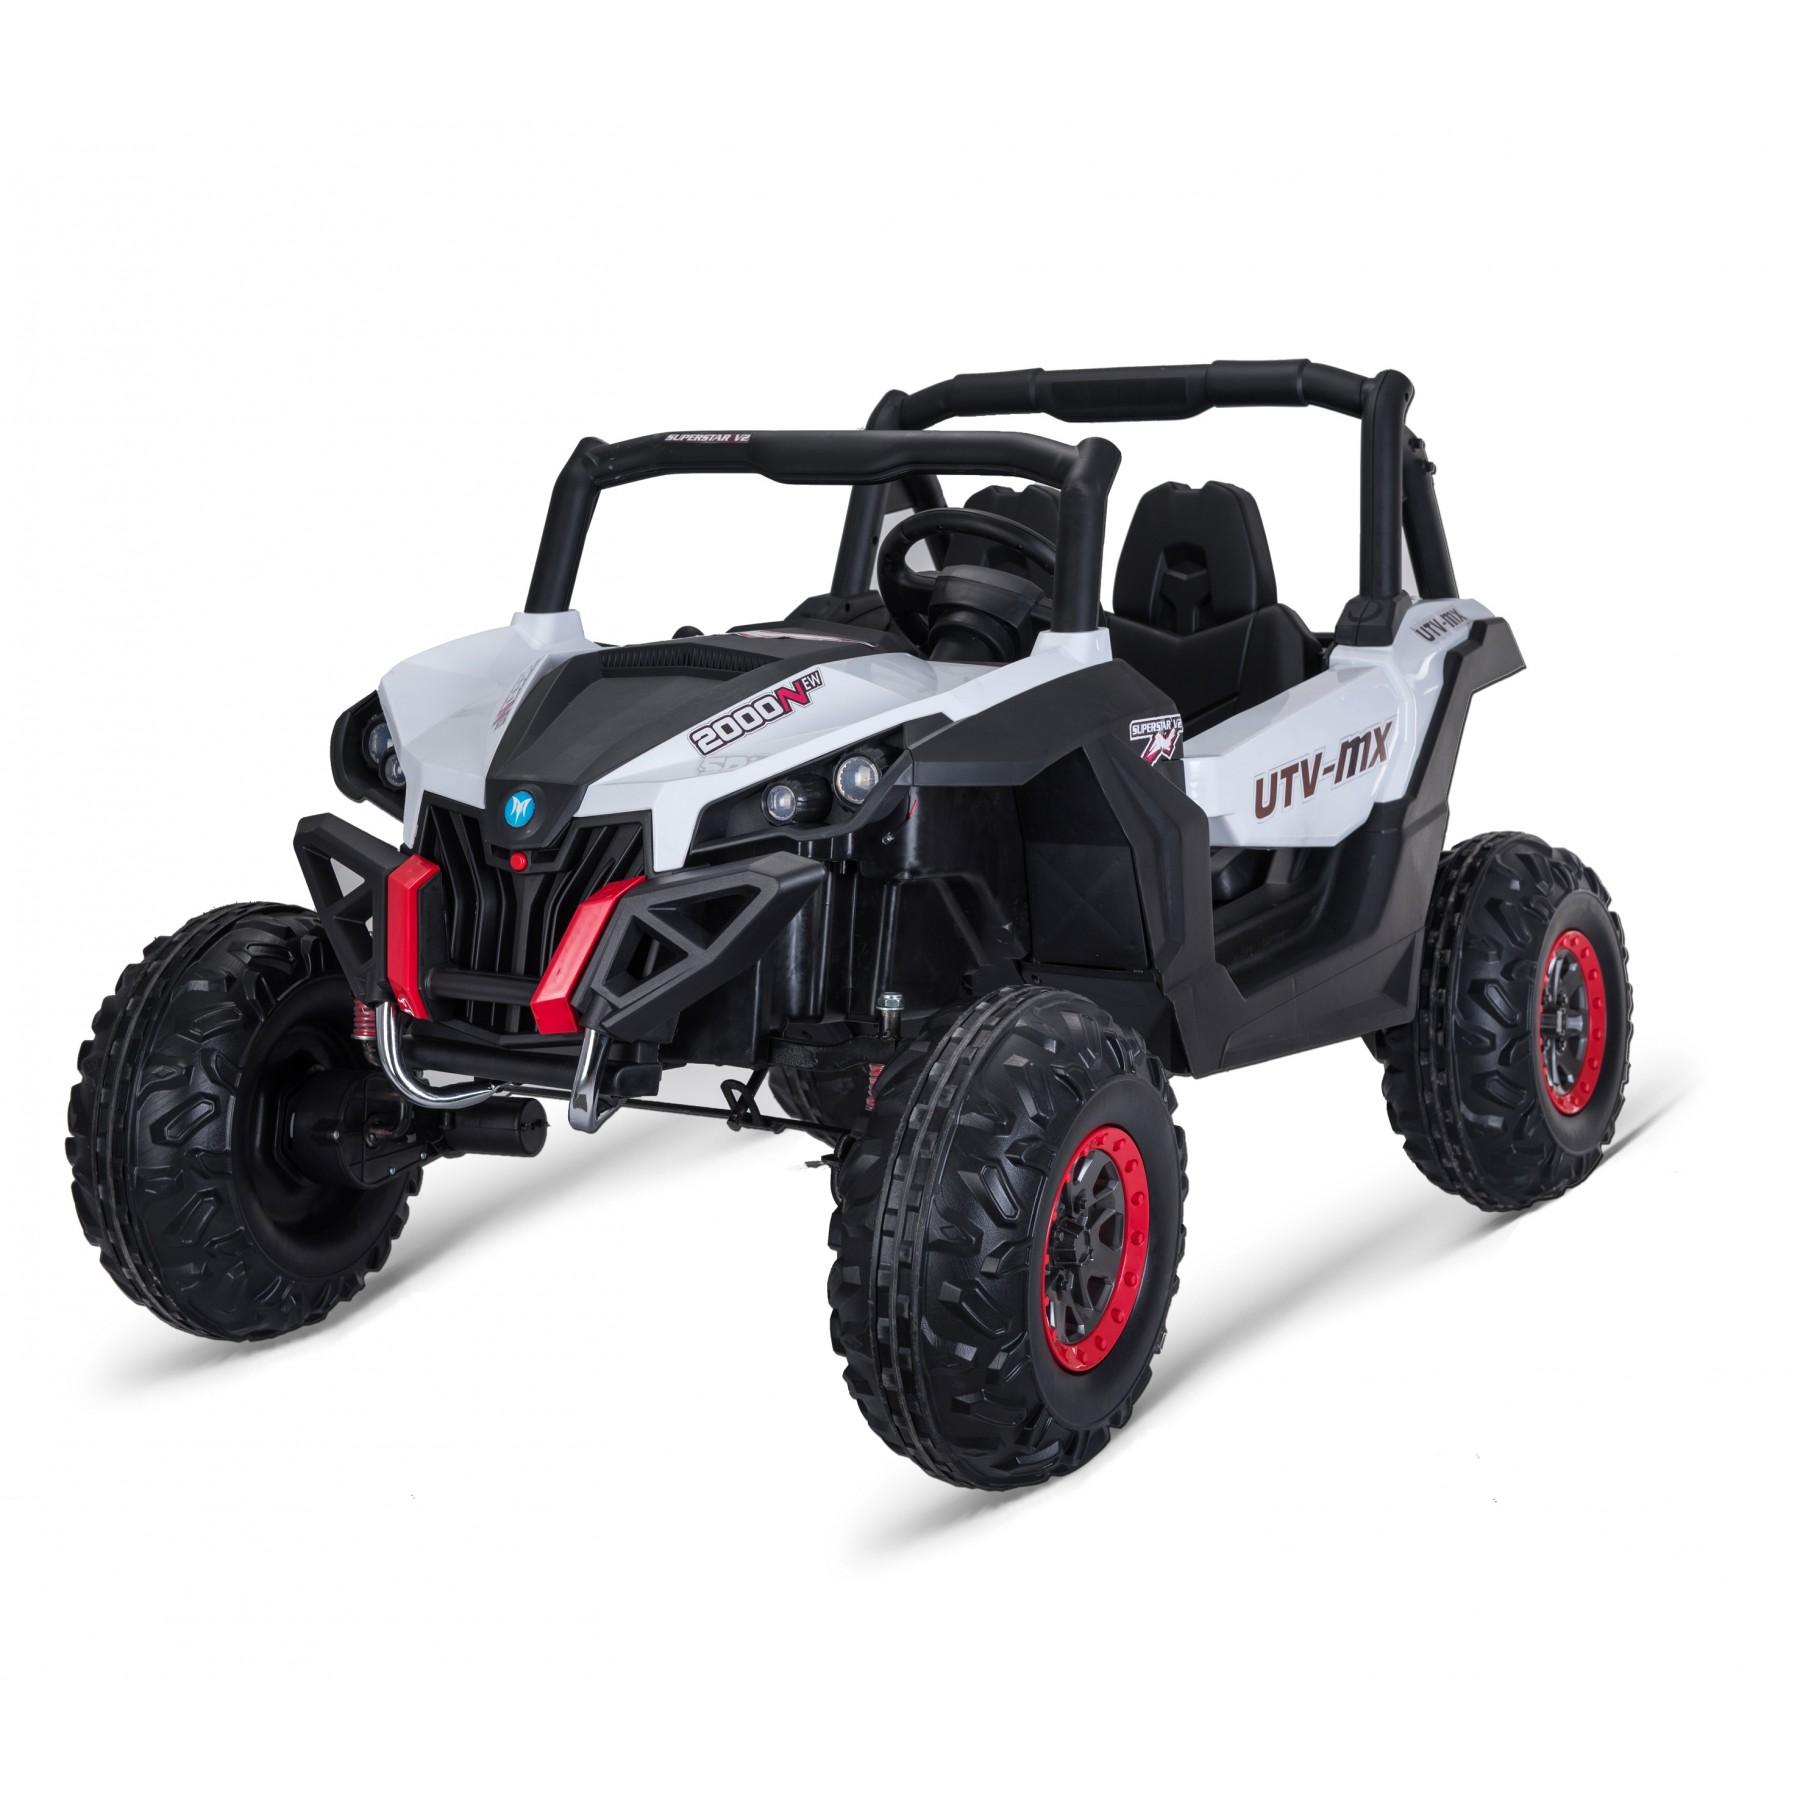 Xtreme 2018 BIG 24v Ride on 4x4 Jeep White